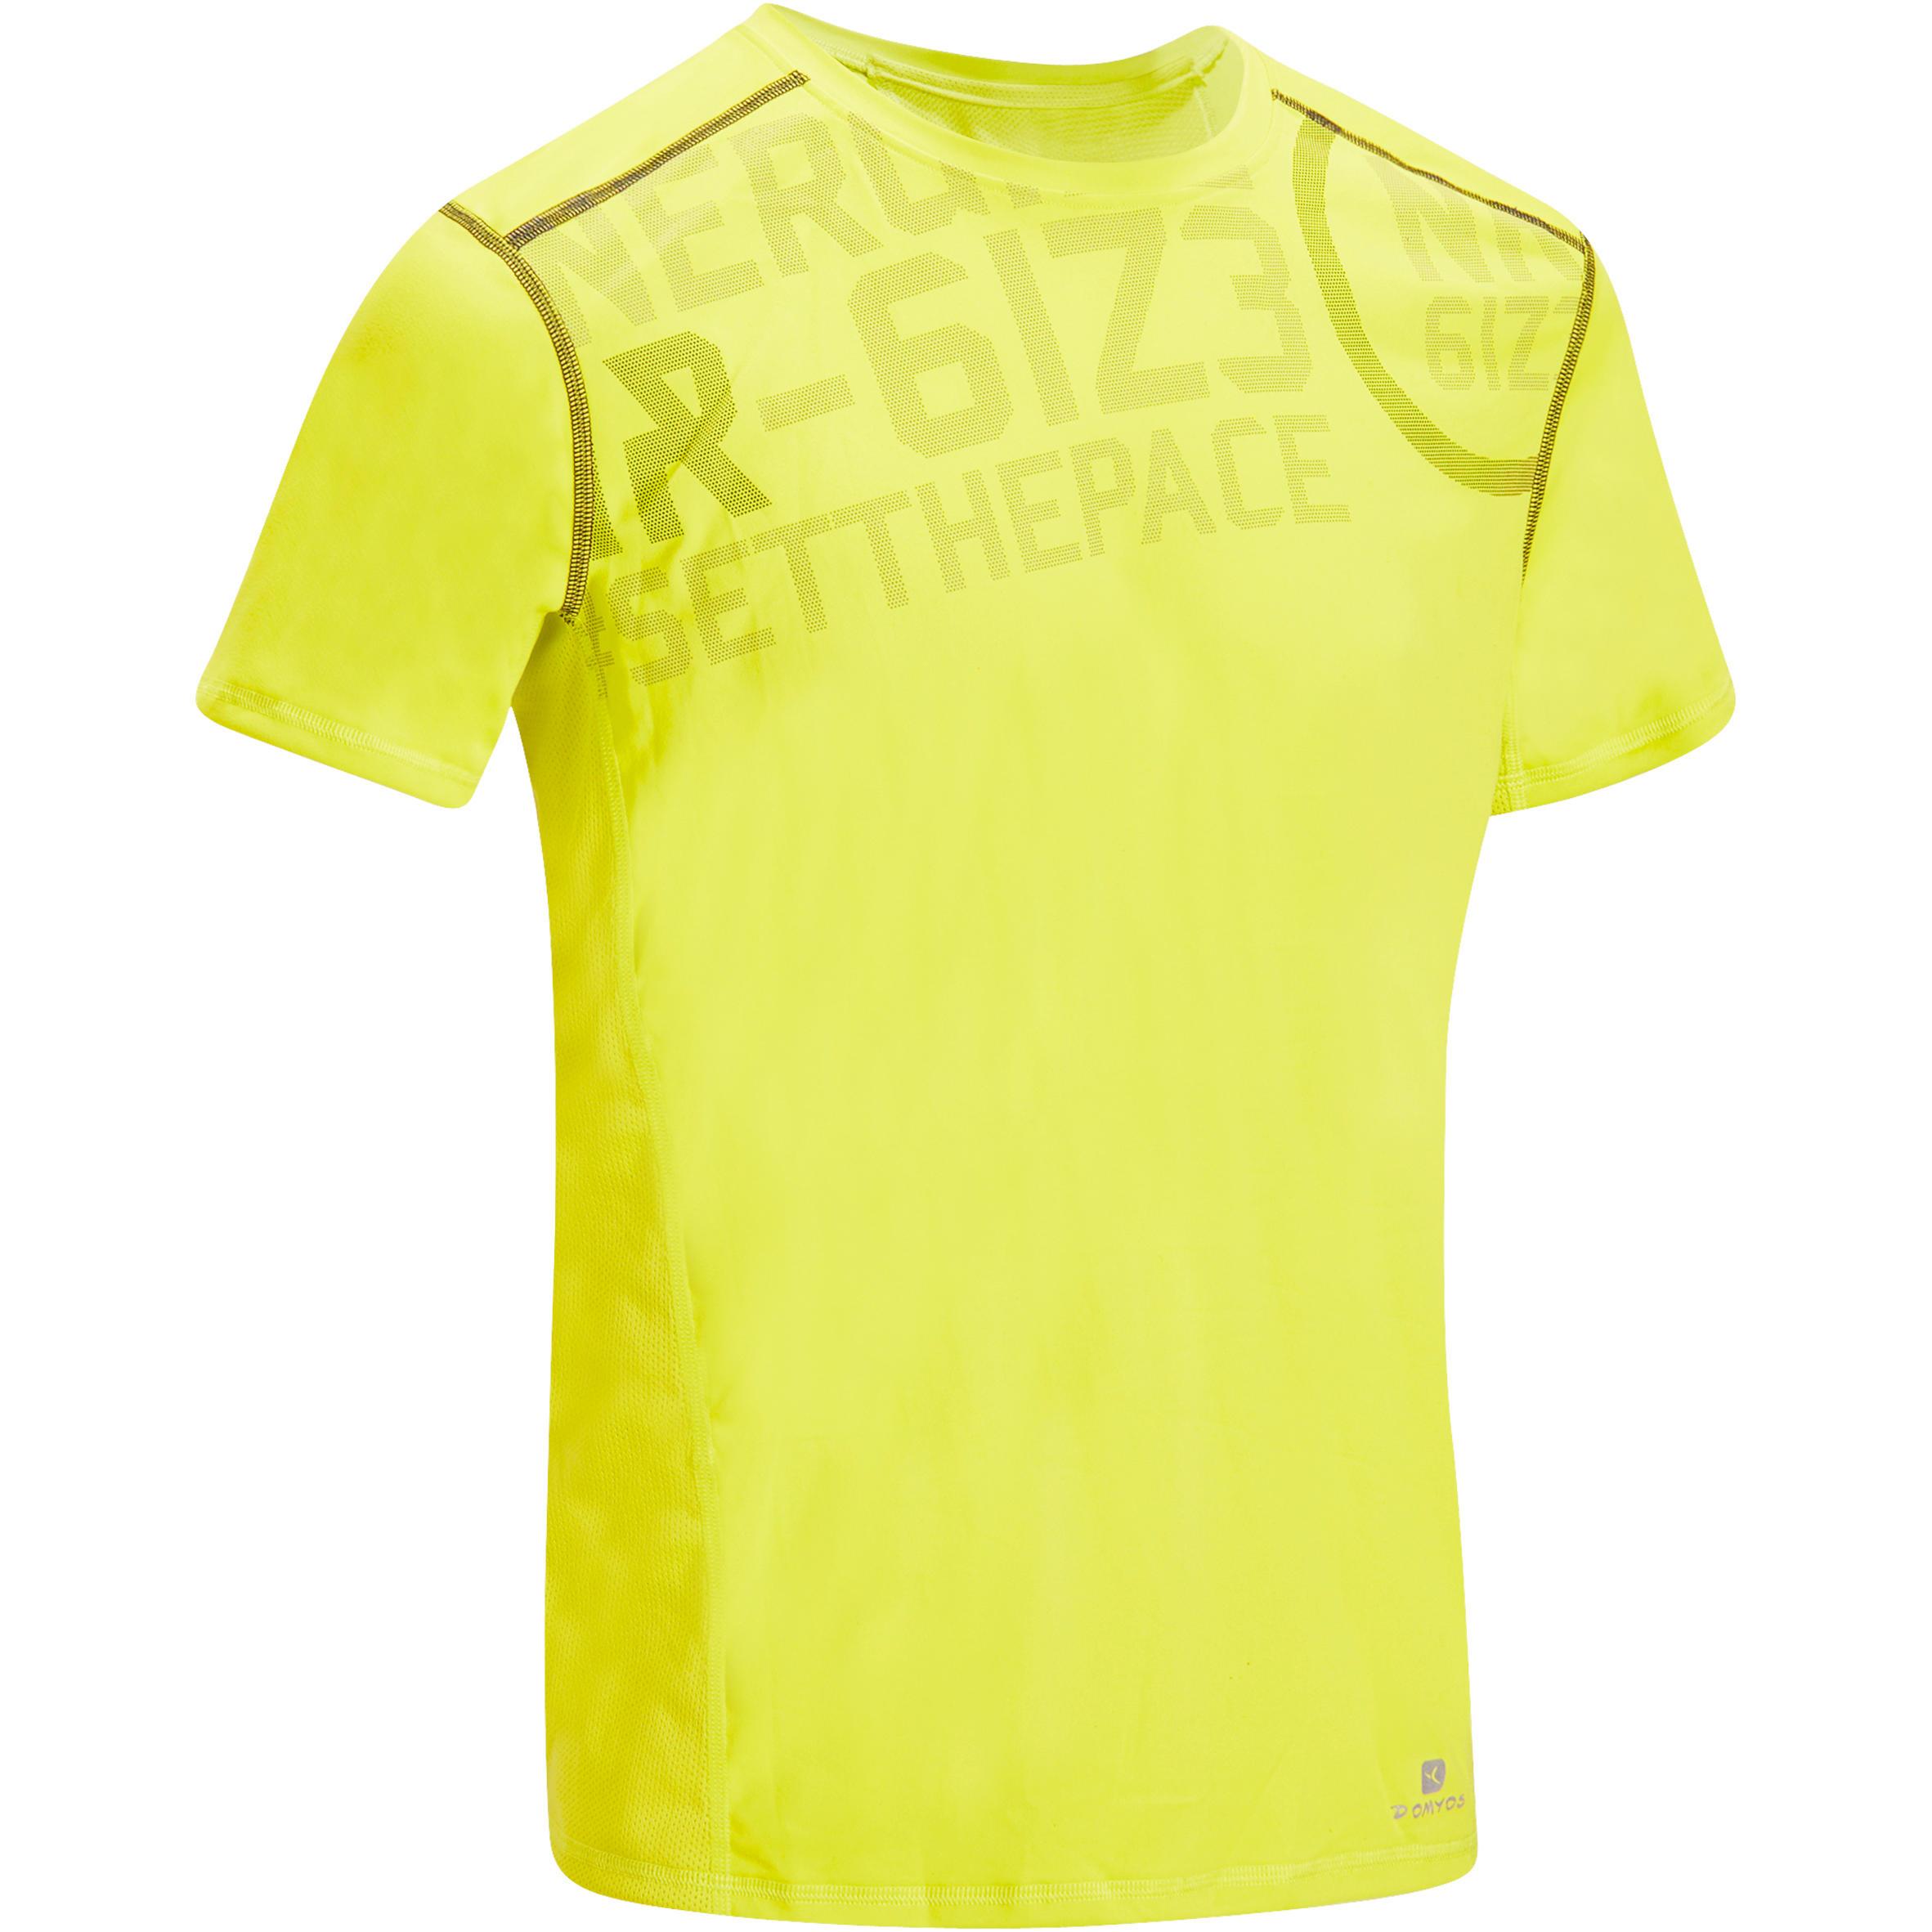 T Jaune Fitness Homme Cardio Shirt Energy WYeIE9bD2H